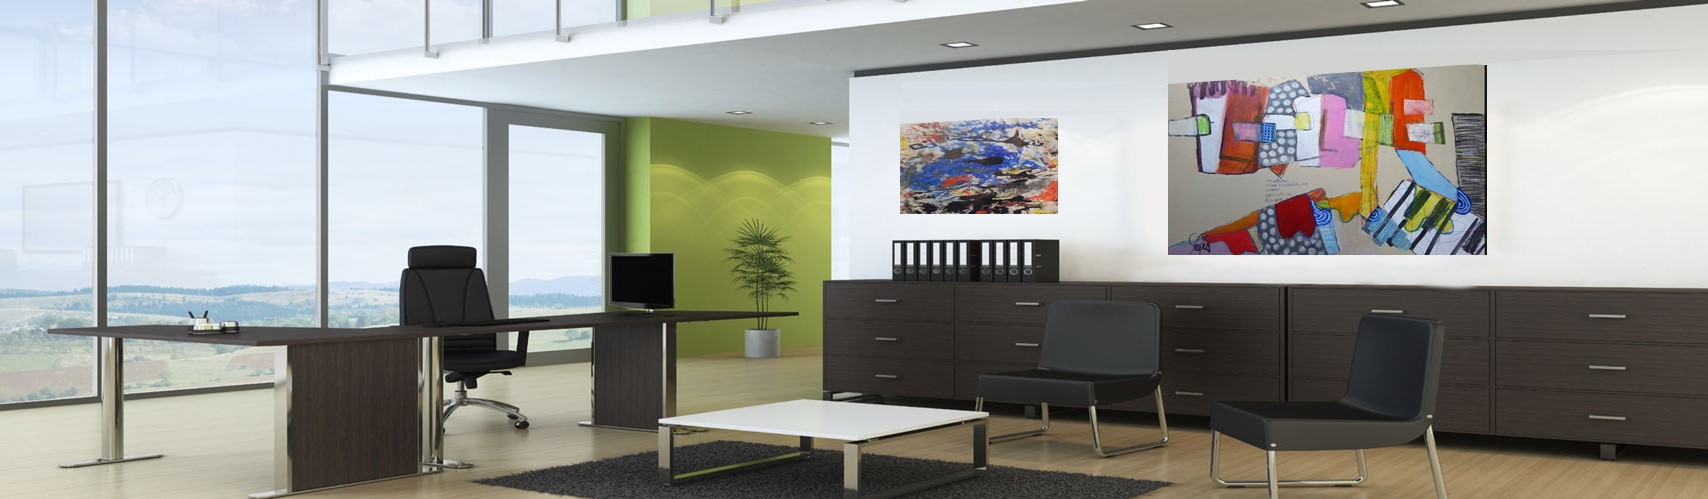 Site Sweep-art Office D05-c